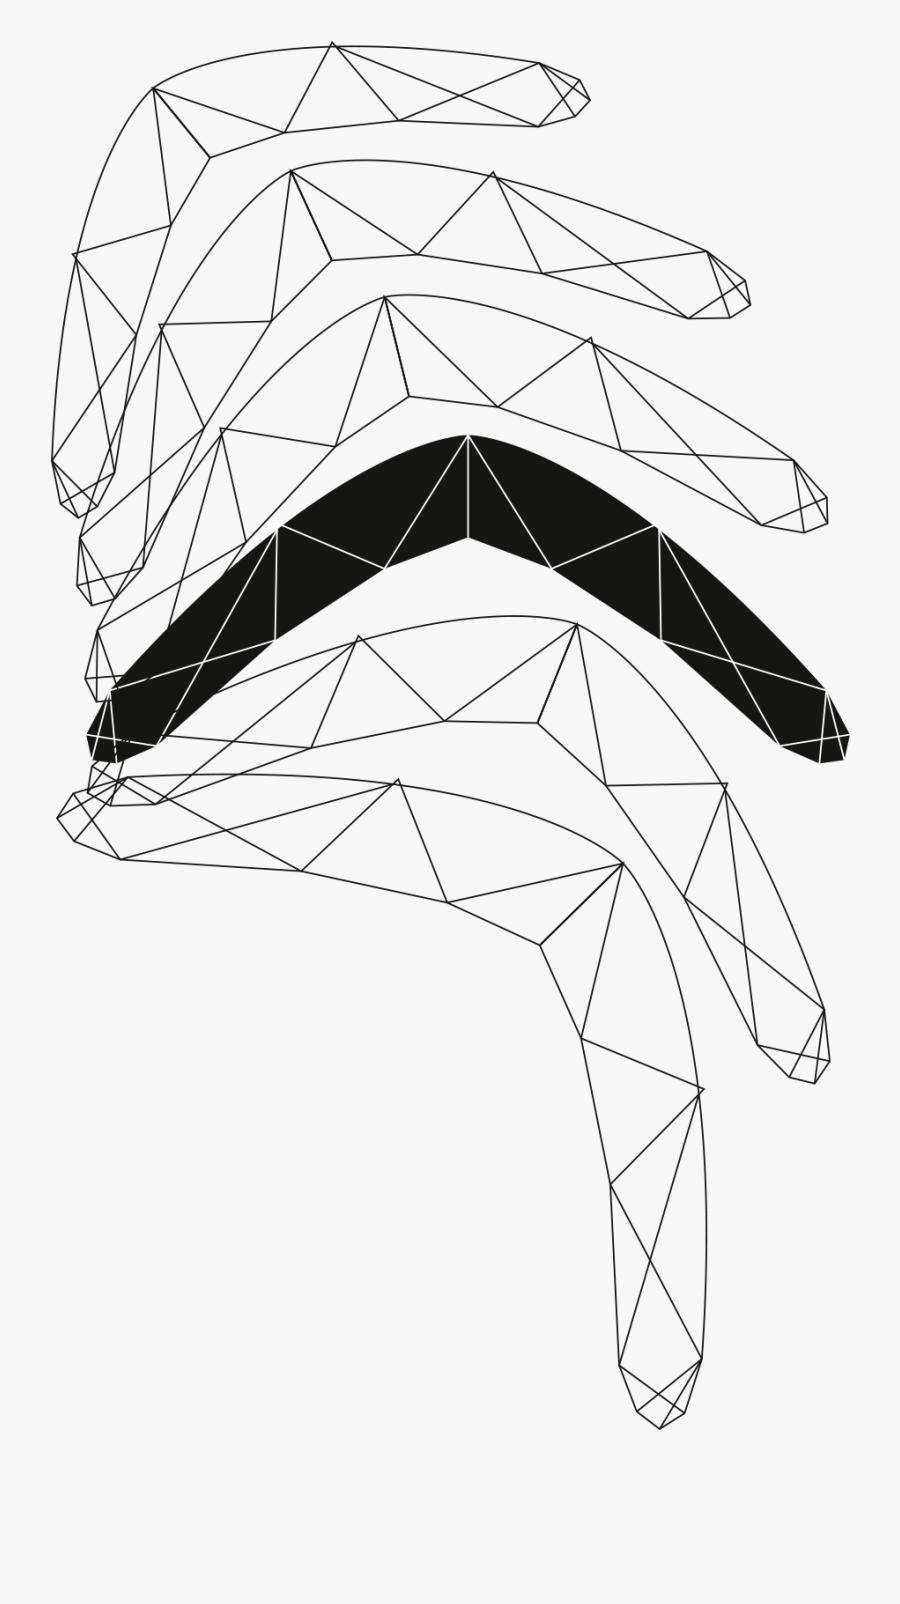 Bullet Drawing Flying - Sketch, Transparent Clipart